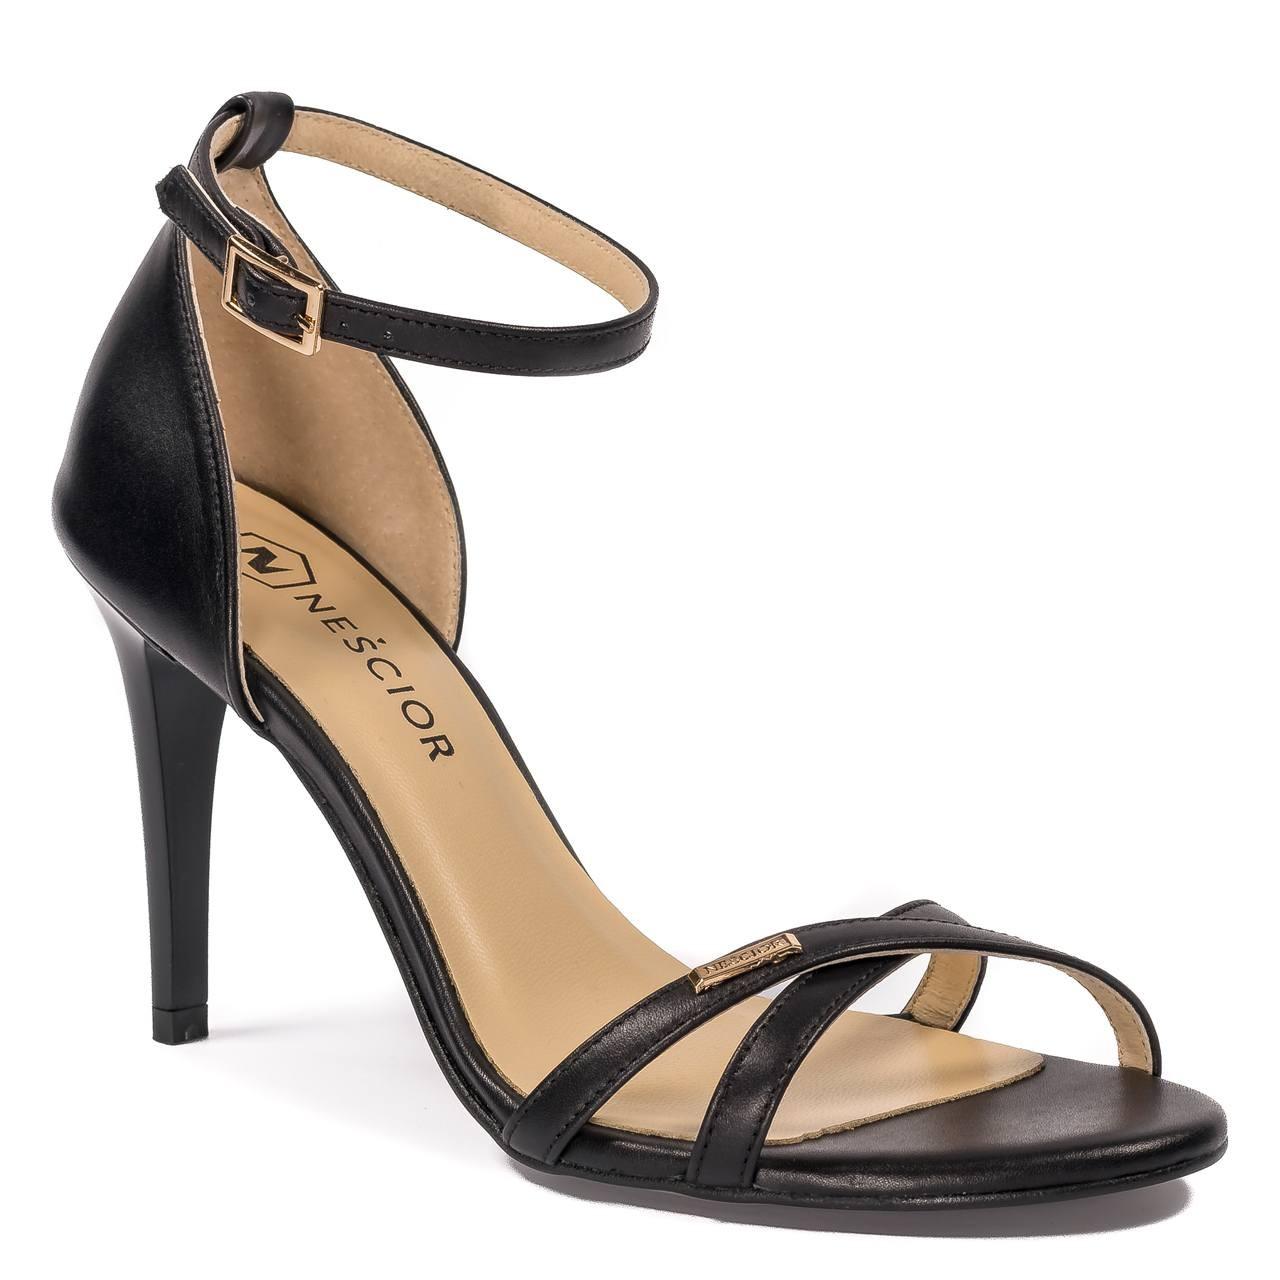 Sandały na obcasie | Sandały na obcasie | ASOS